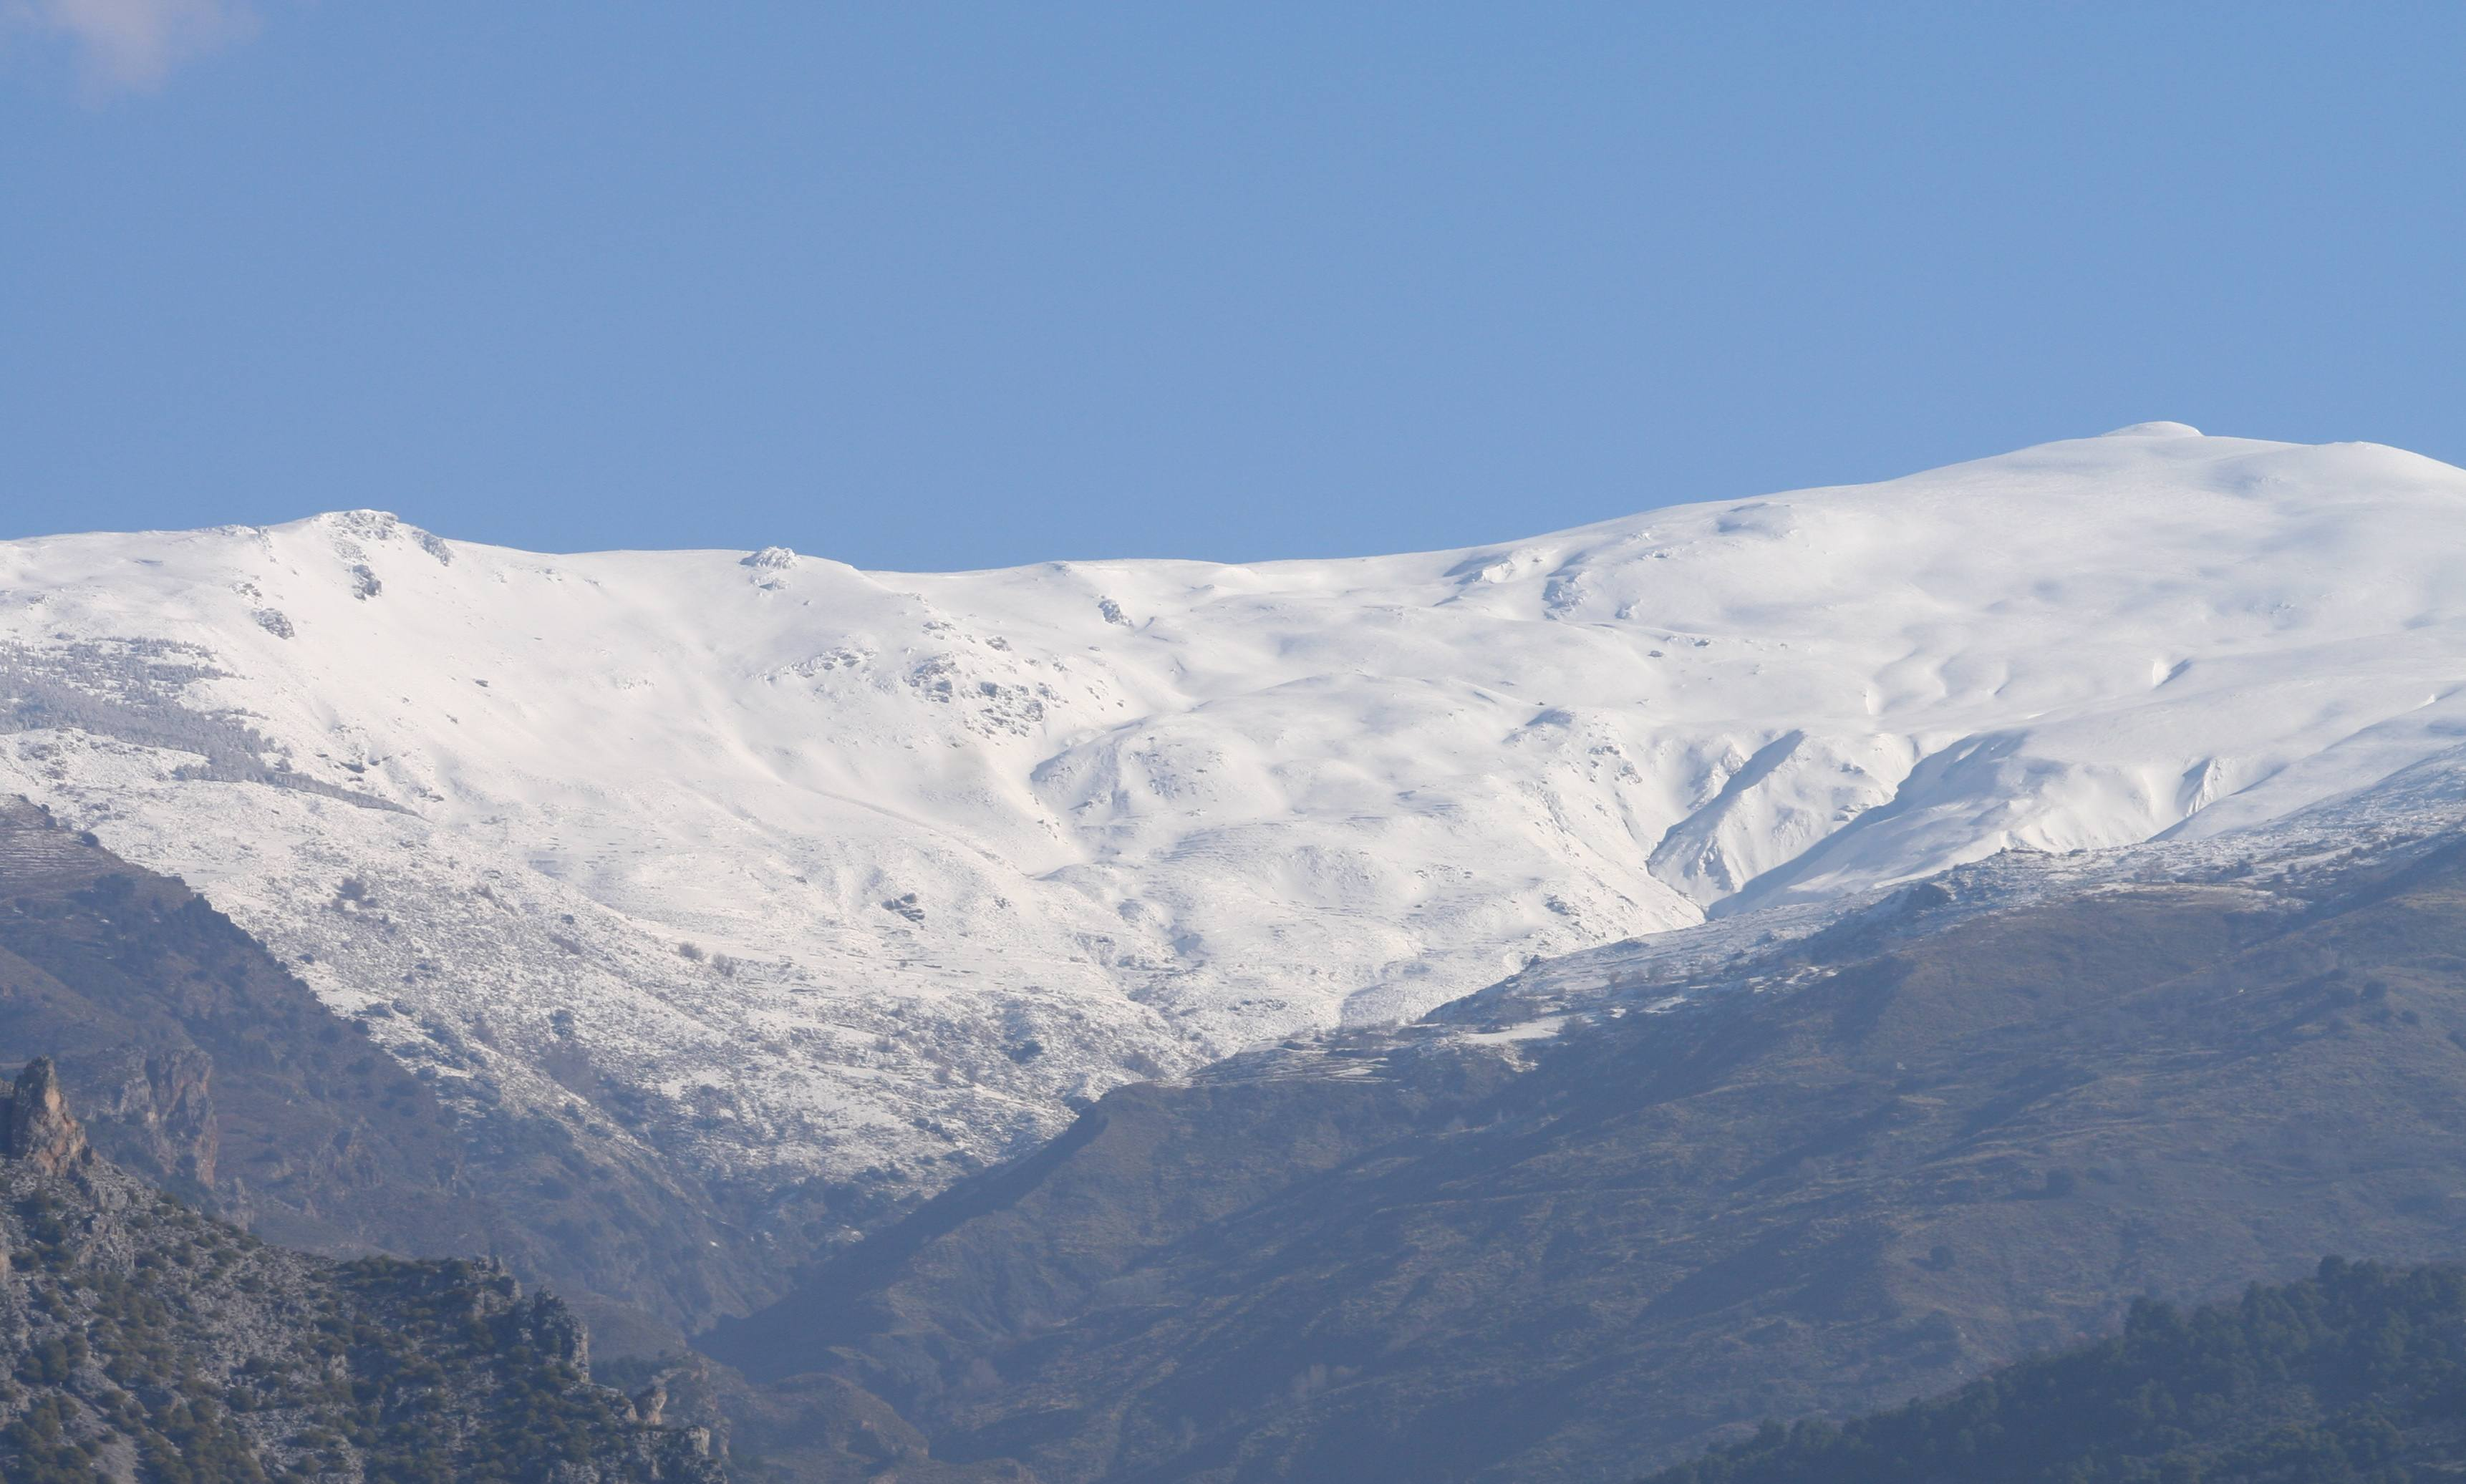 La Sierra Nevada Imposante.jpg